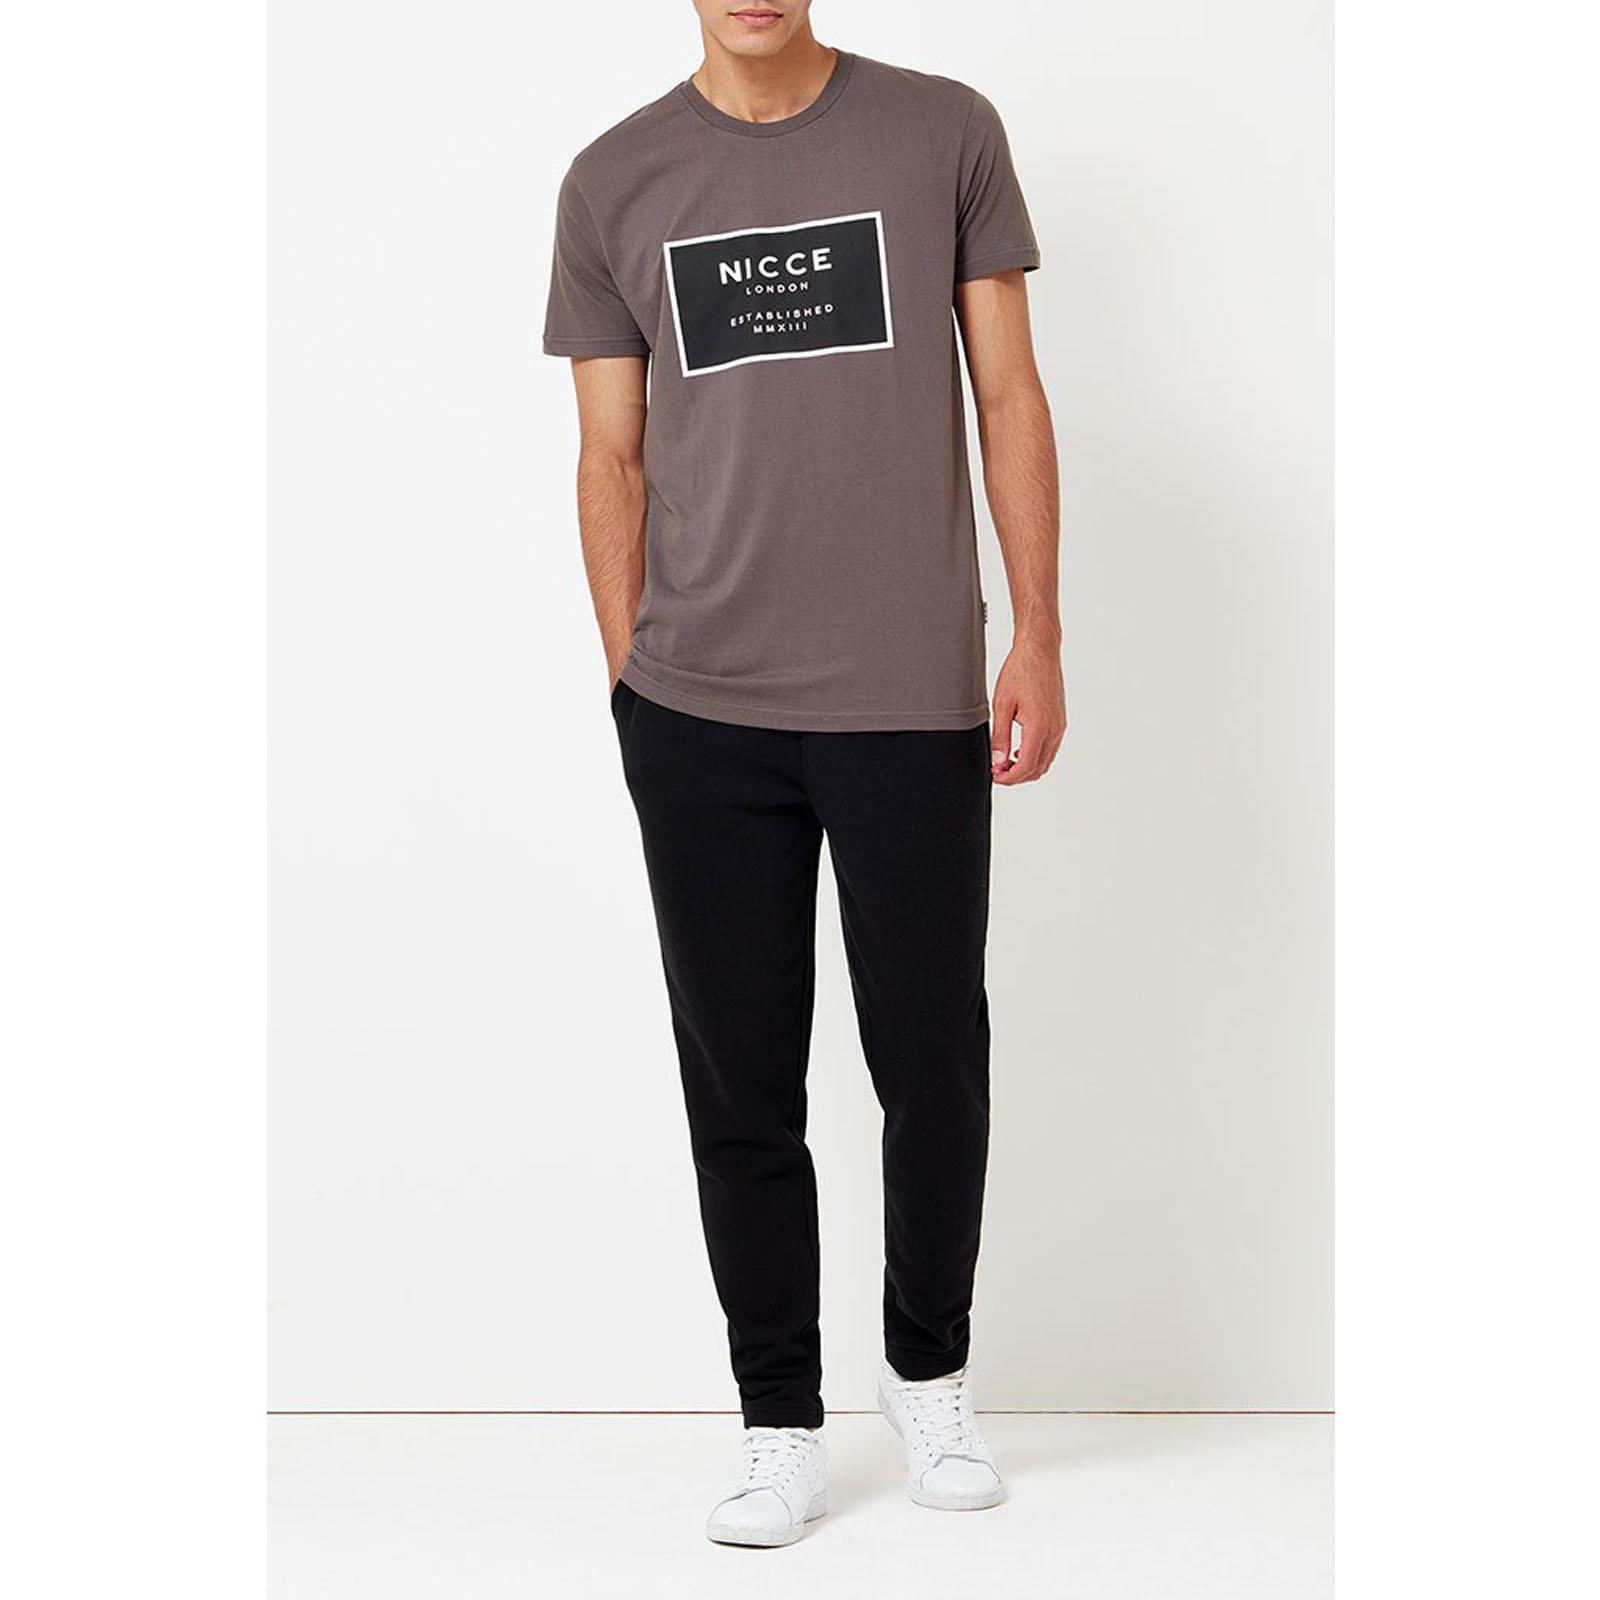 Hawkins /& JOSEPH Winston Tartan T-shirt 80 S CASUALS Inglese Bulldog subcultura